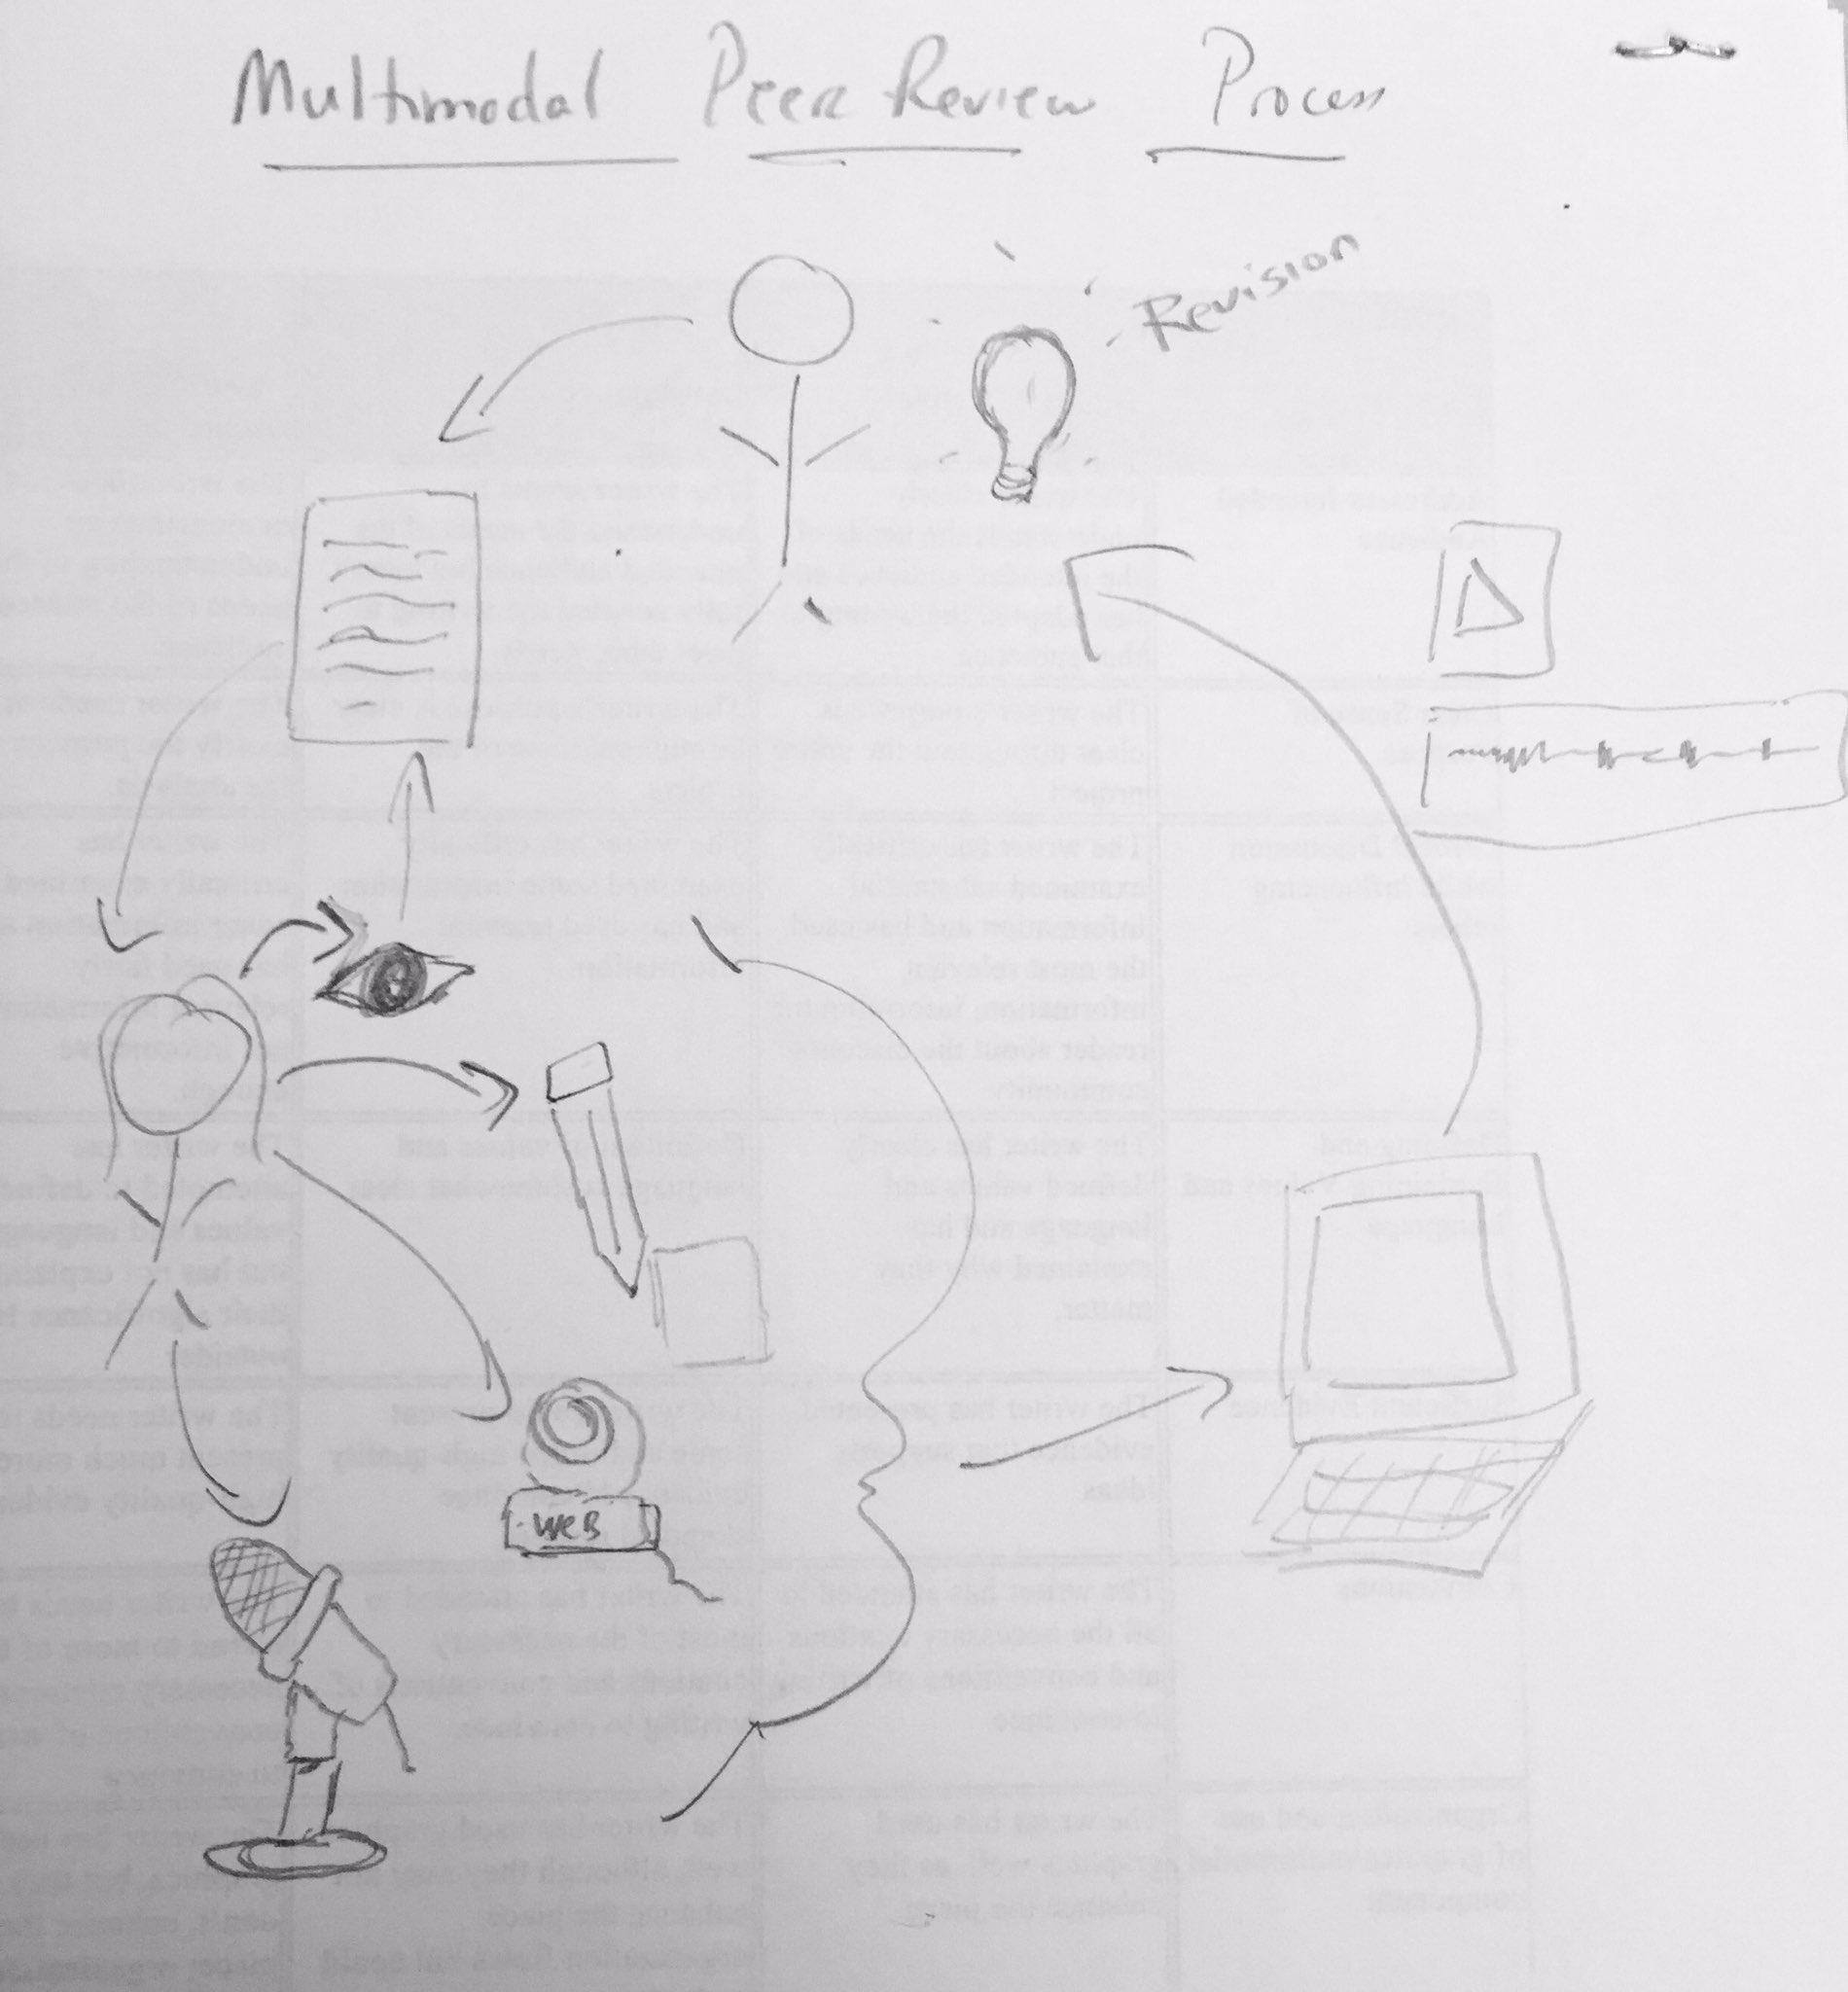 My notes for @collin_bjork #cwcon #f9 https://t.co/rrsJYMzxHU